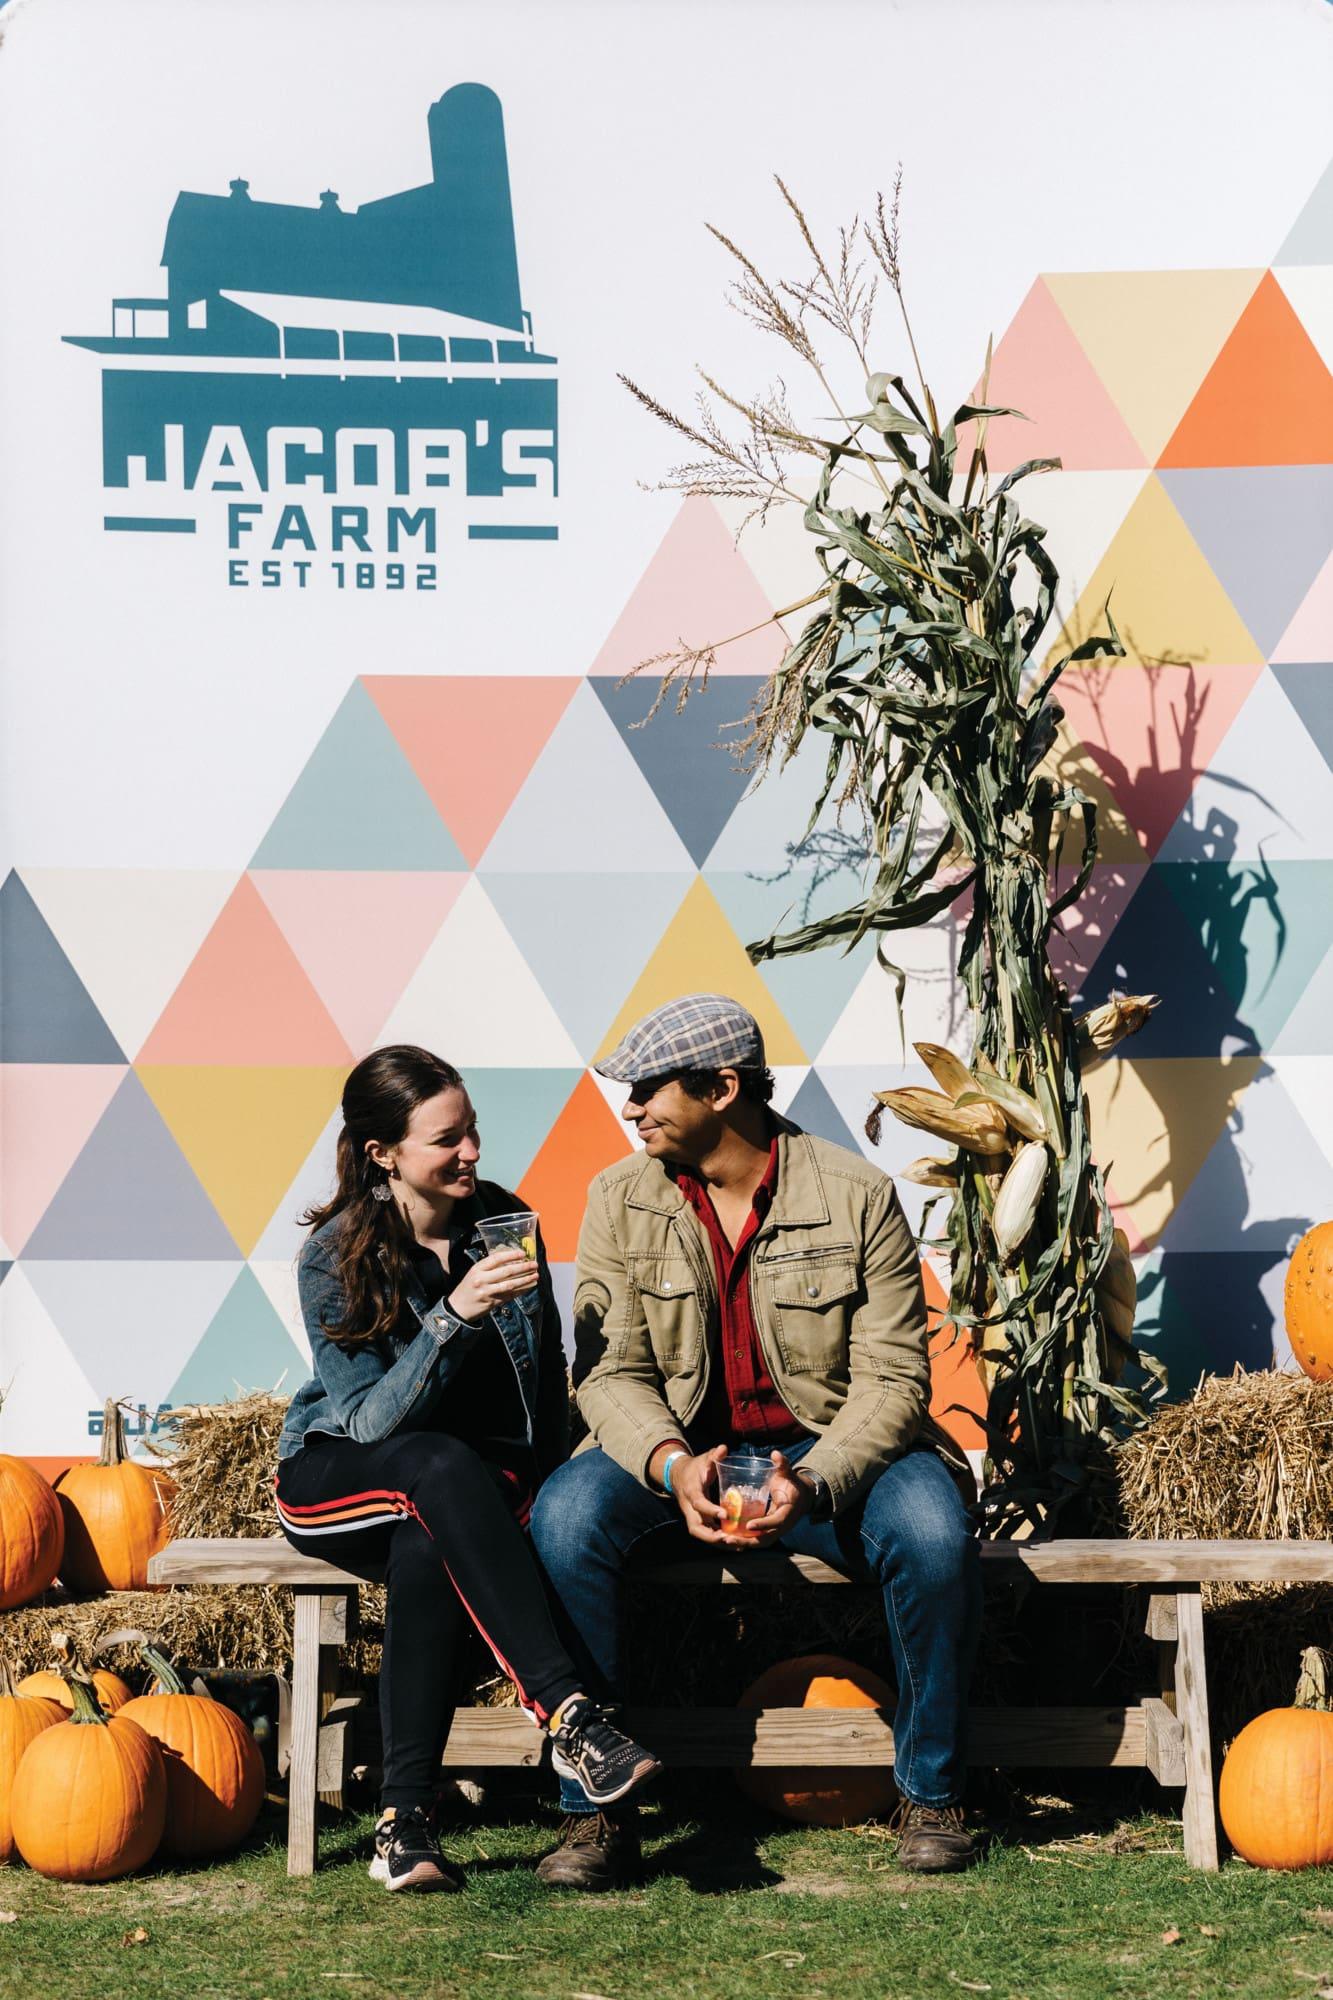 Couple sitting outside at Jacob's Farm